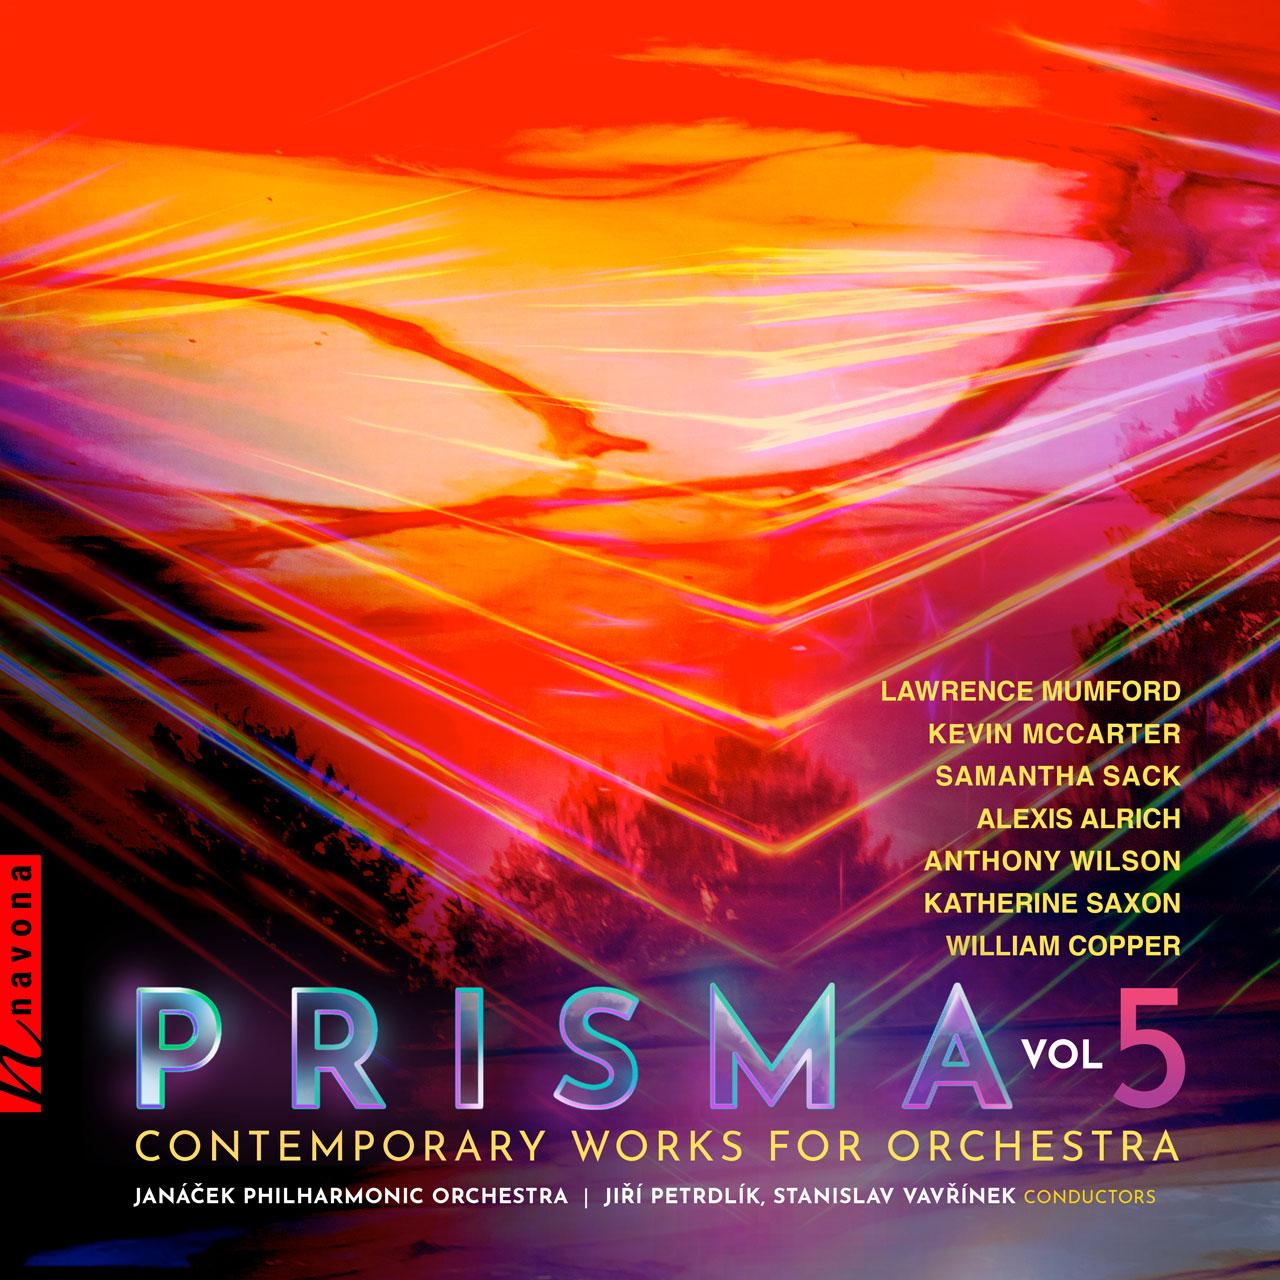 Prisma Vol. 5